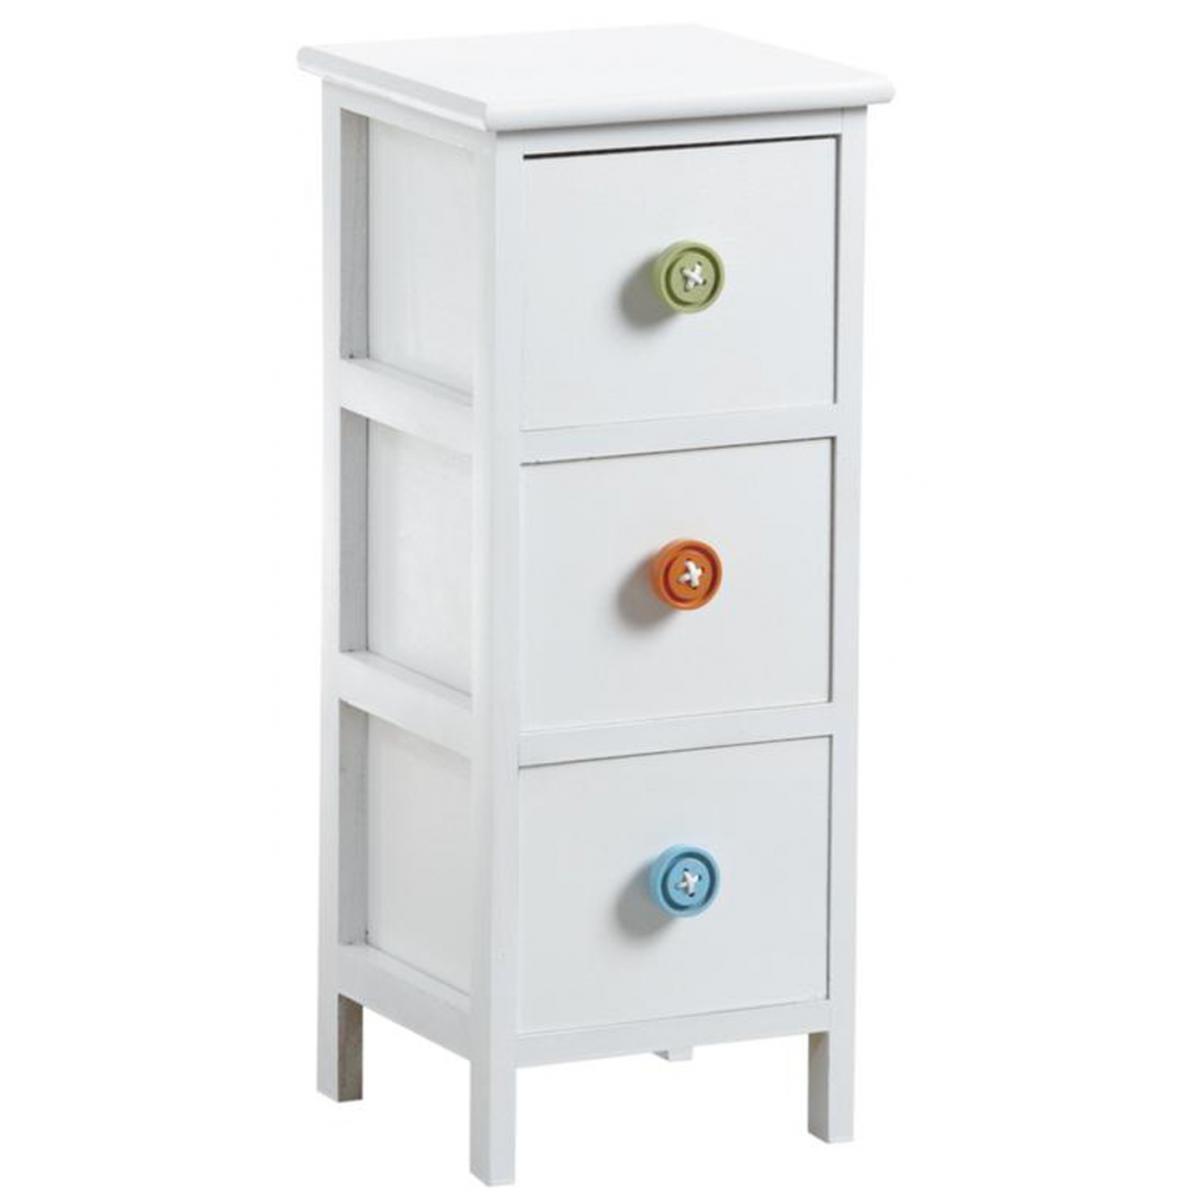 Pegane Commode en medium et bois laqué blanc avec 3 tiroirs - 25 x 25 x 60 cm -PEGANE-